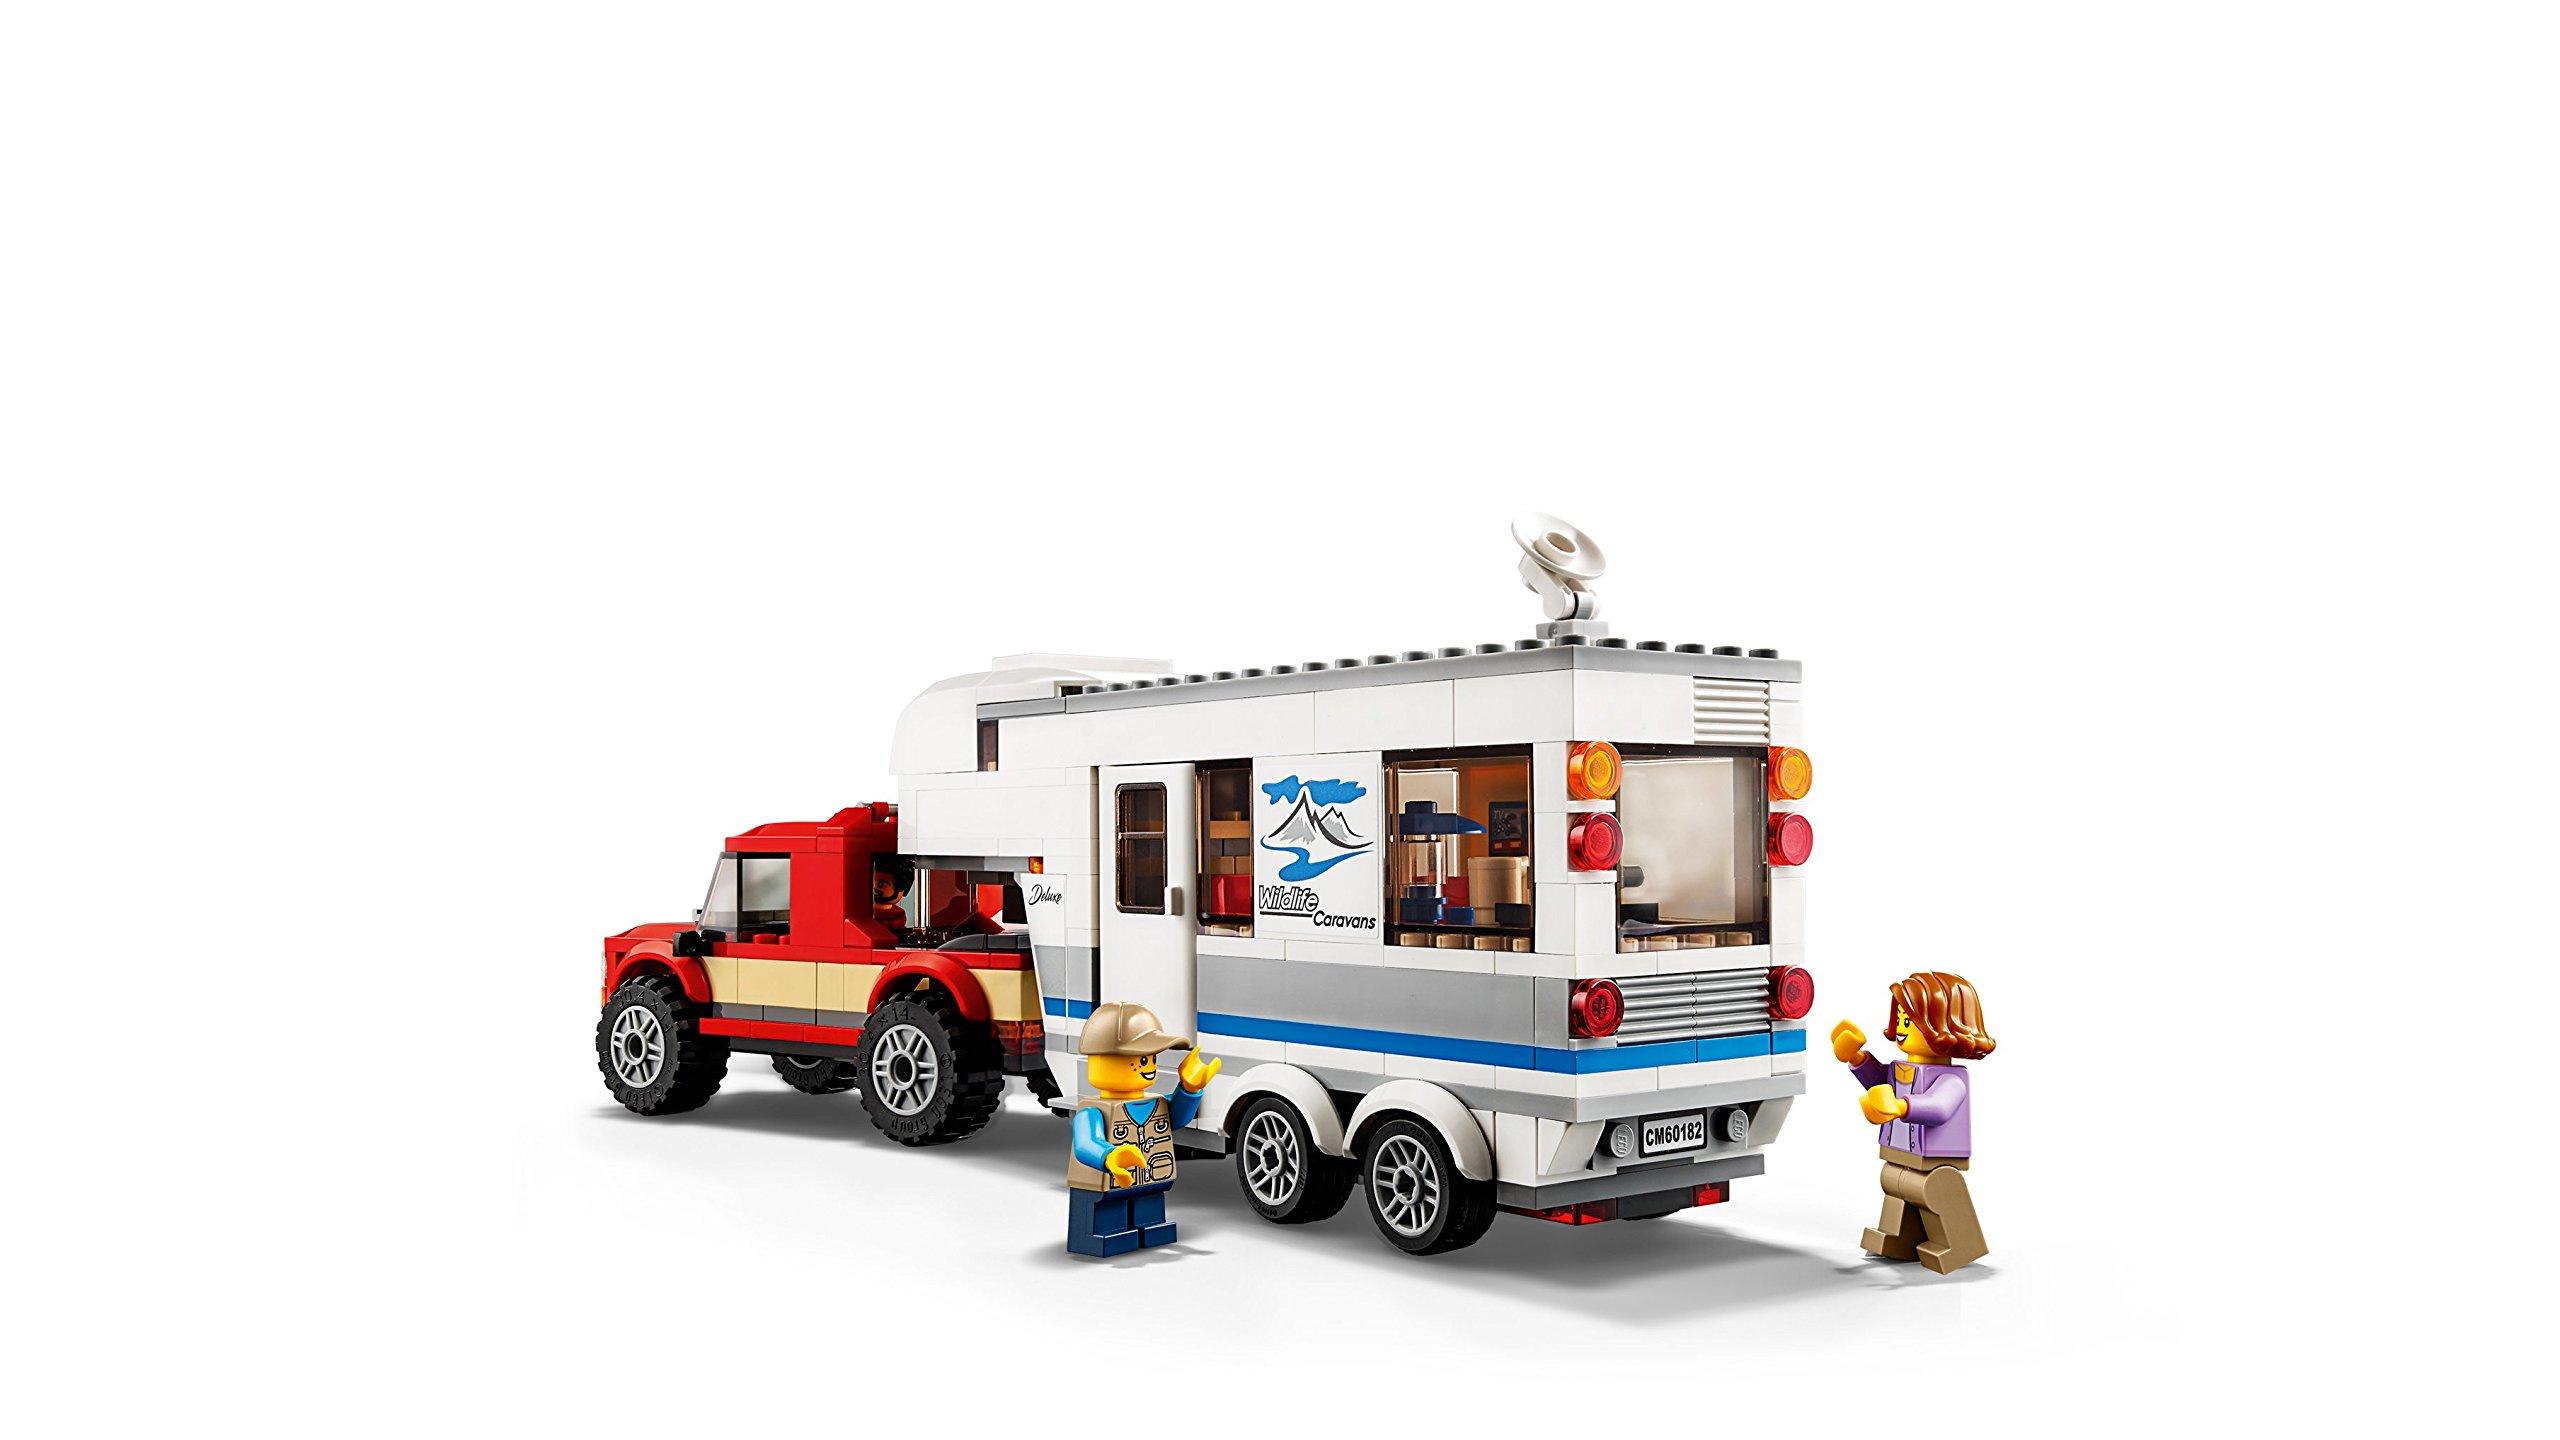 LEGO- City Pickup e Caravan, Multicolore, 60182 3 spesavip